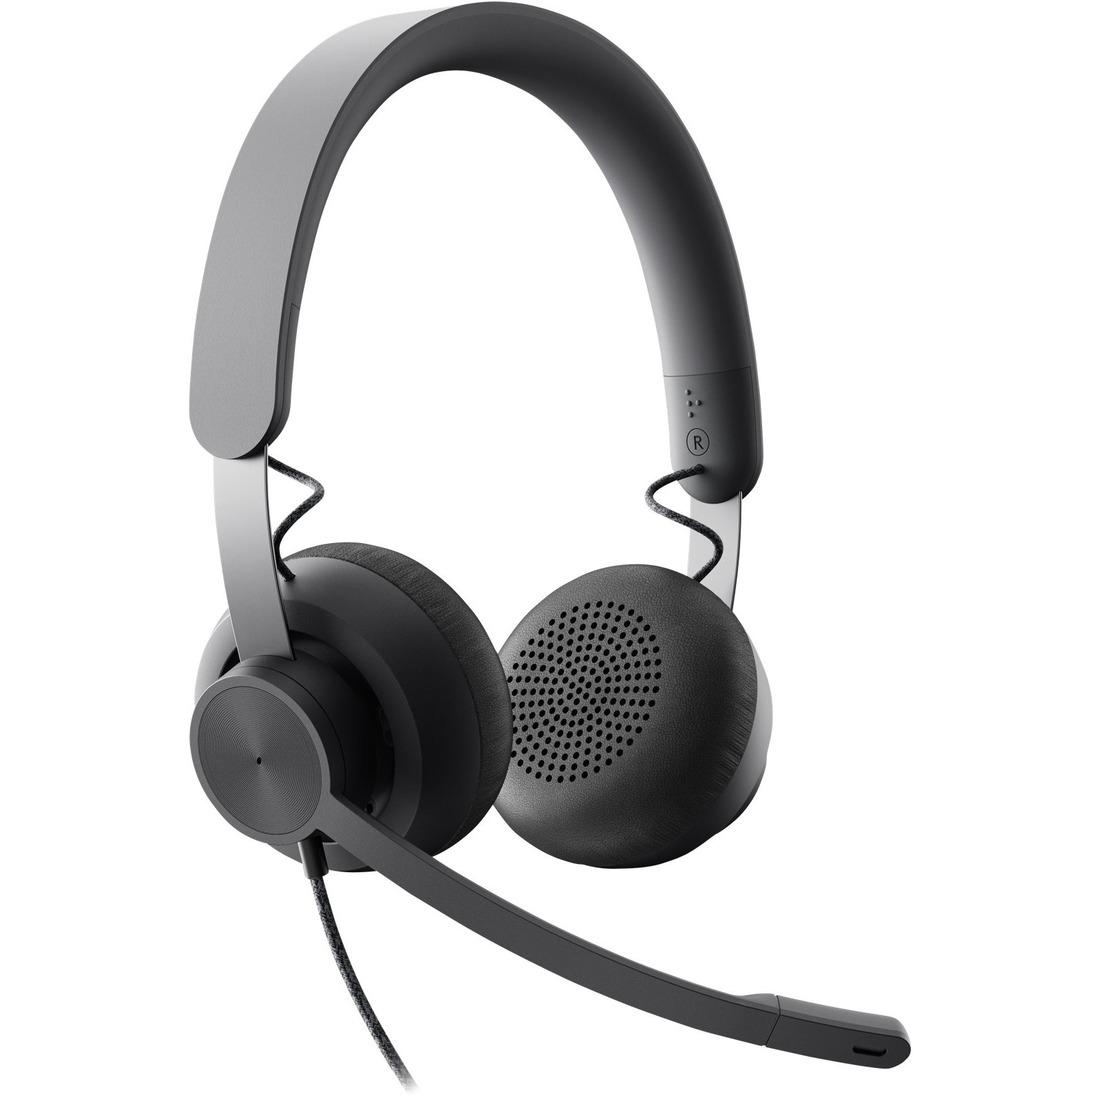 Logitech Zone Headset_subImage_1